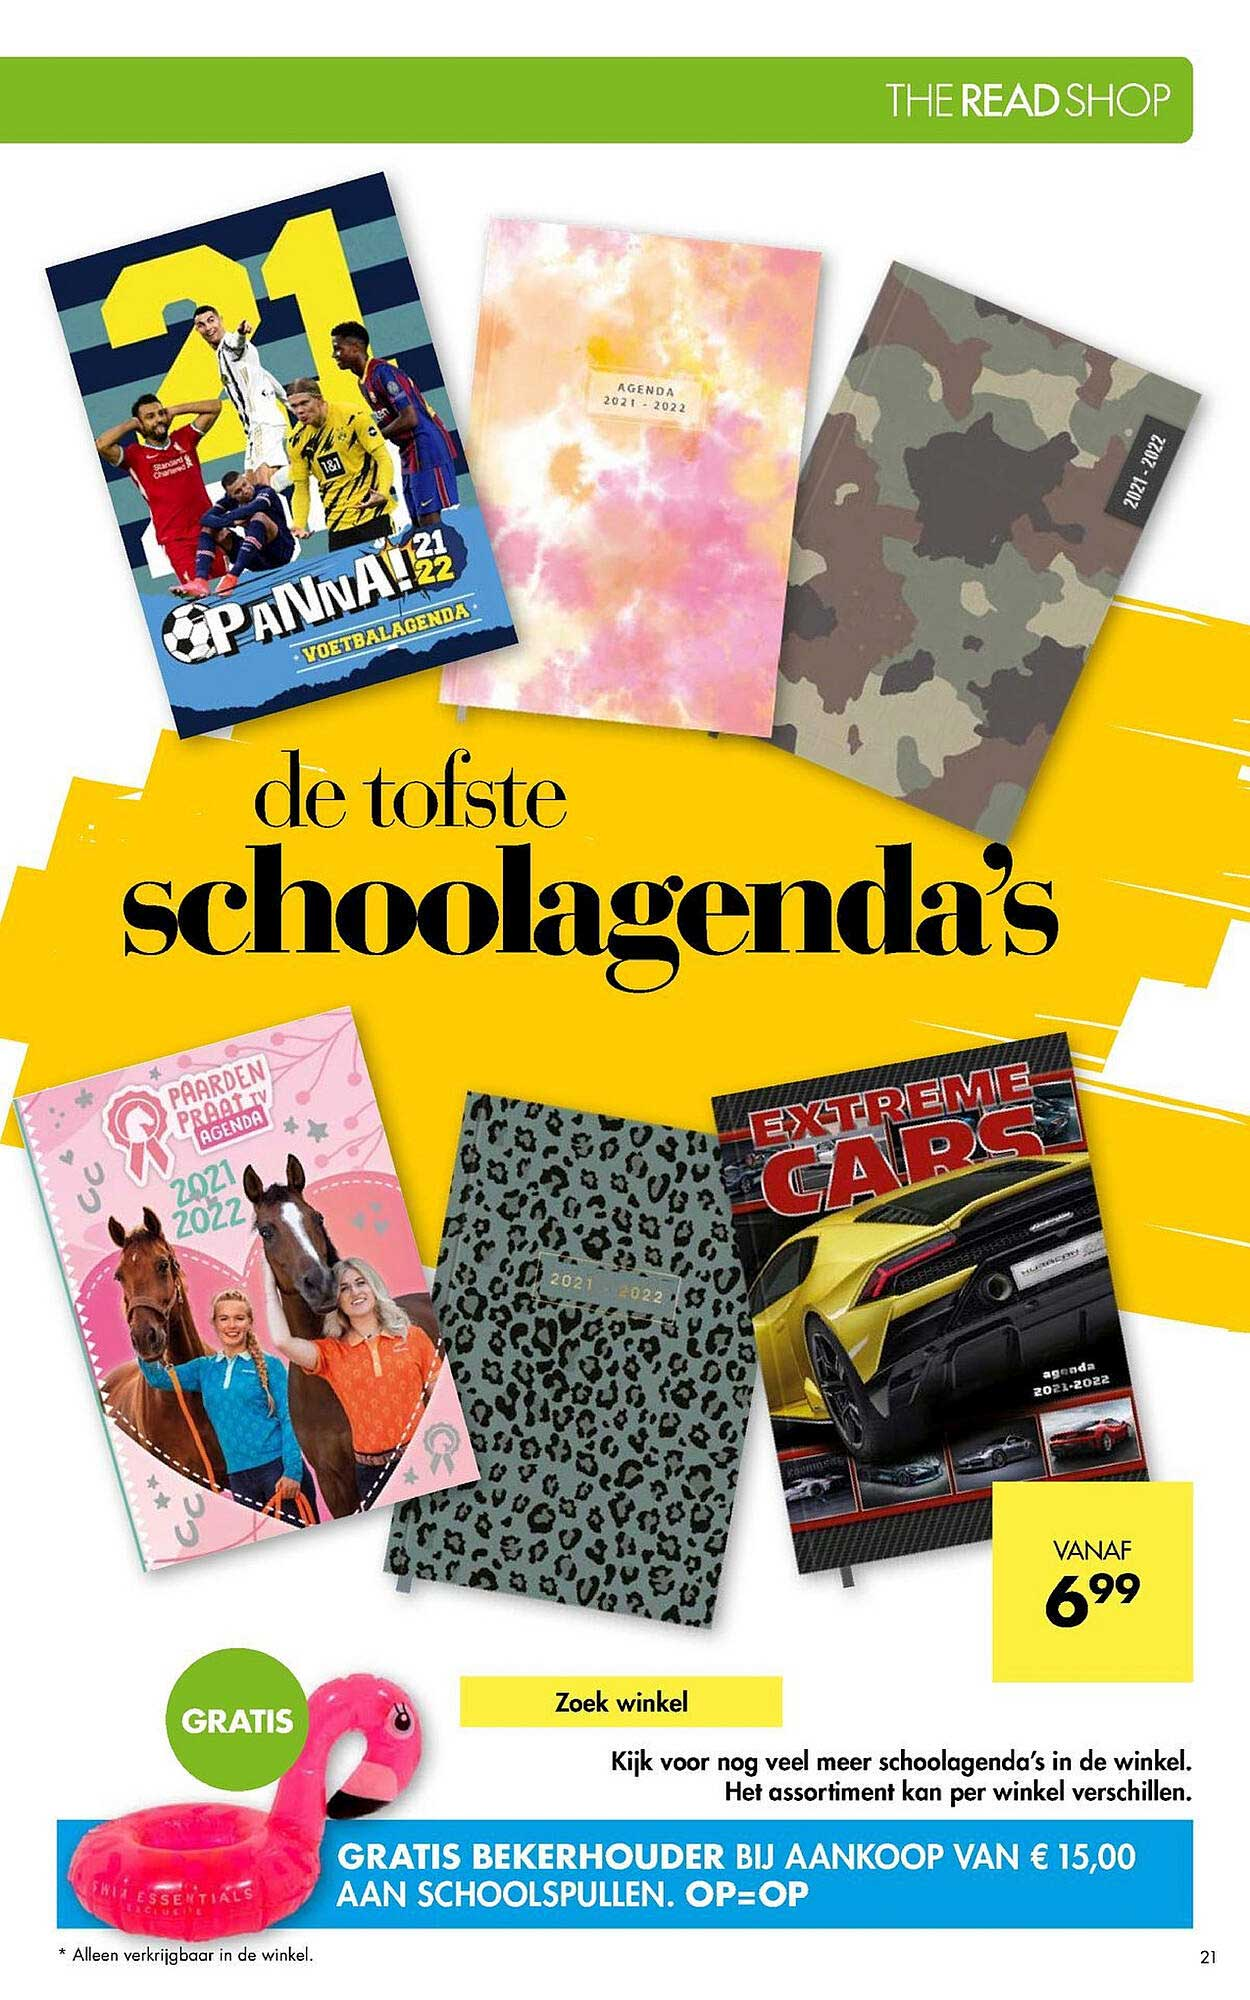 The Read Shop Schoolagenda's